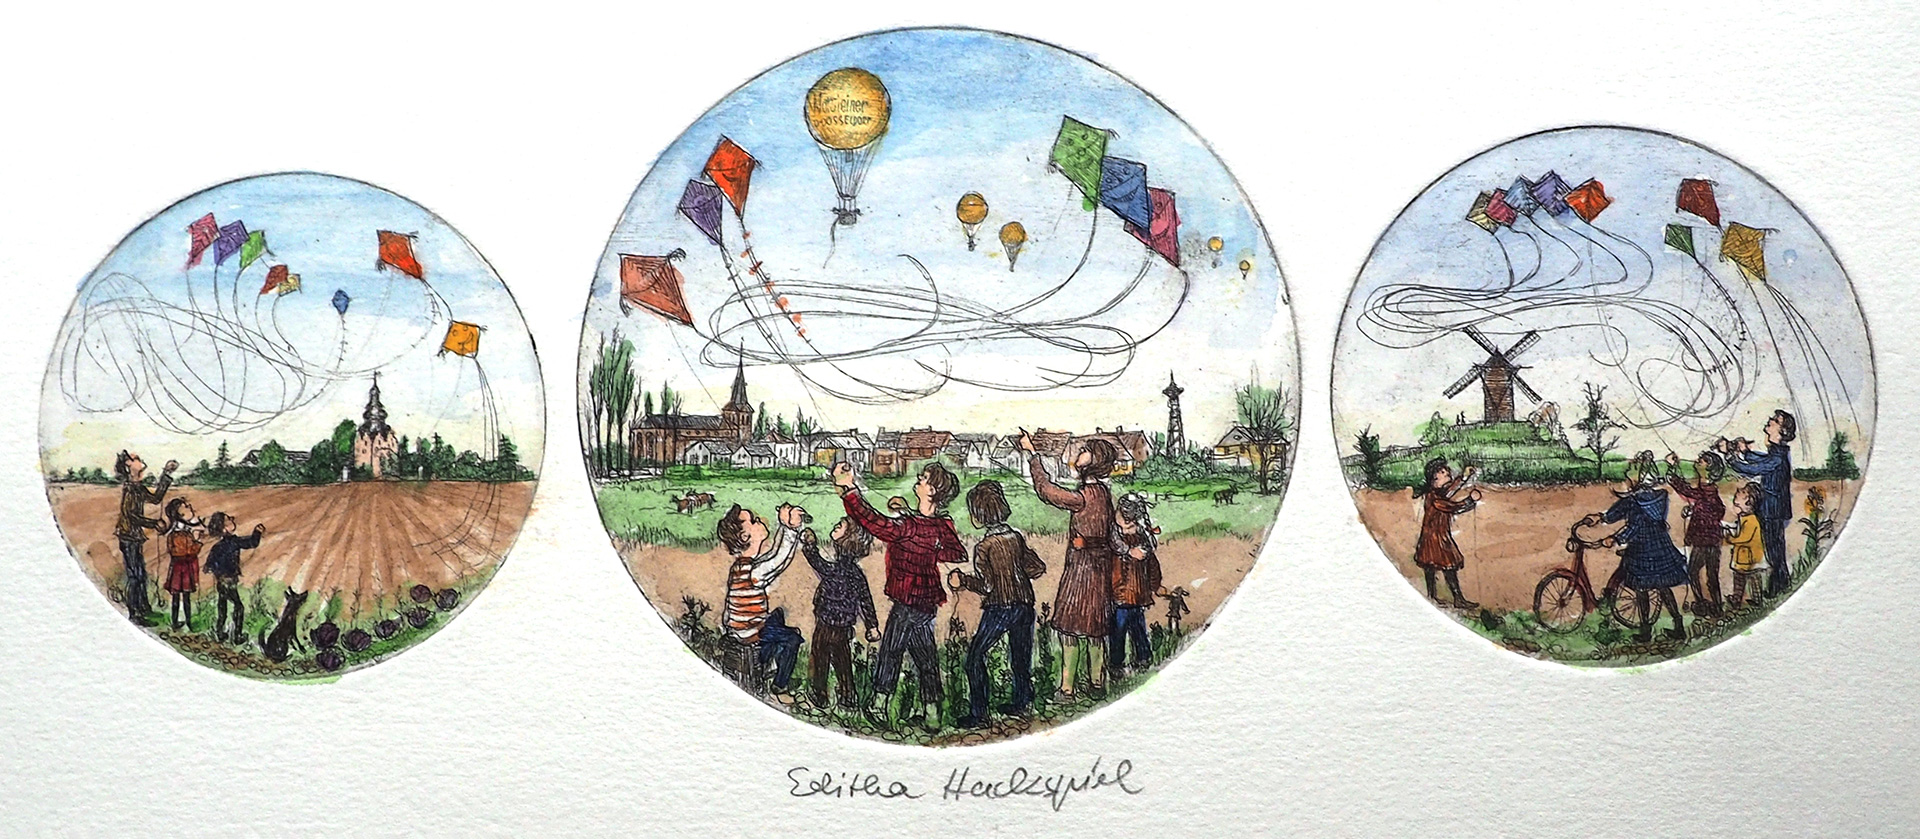 Editha Hackspiel: Düsseldorf